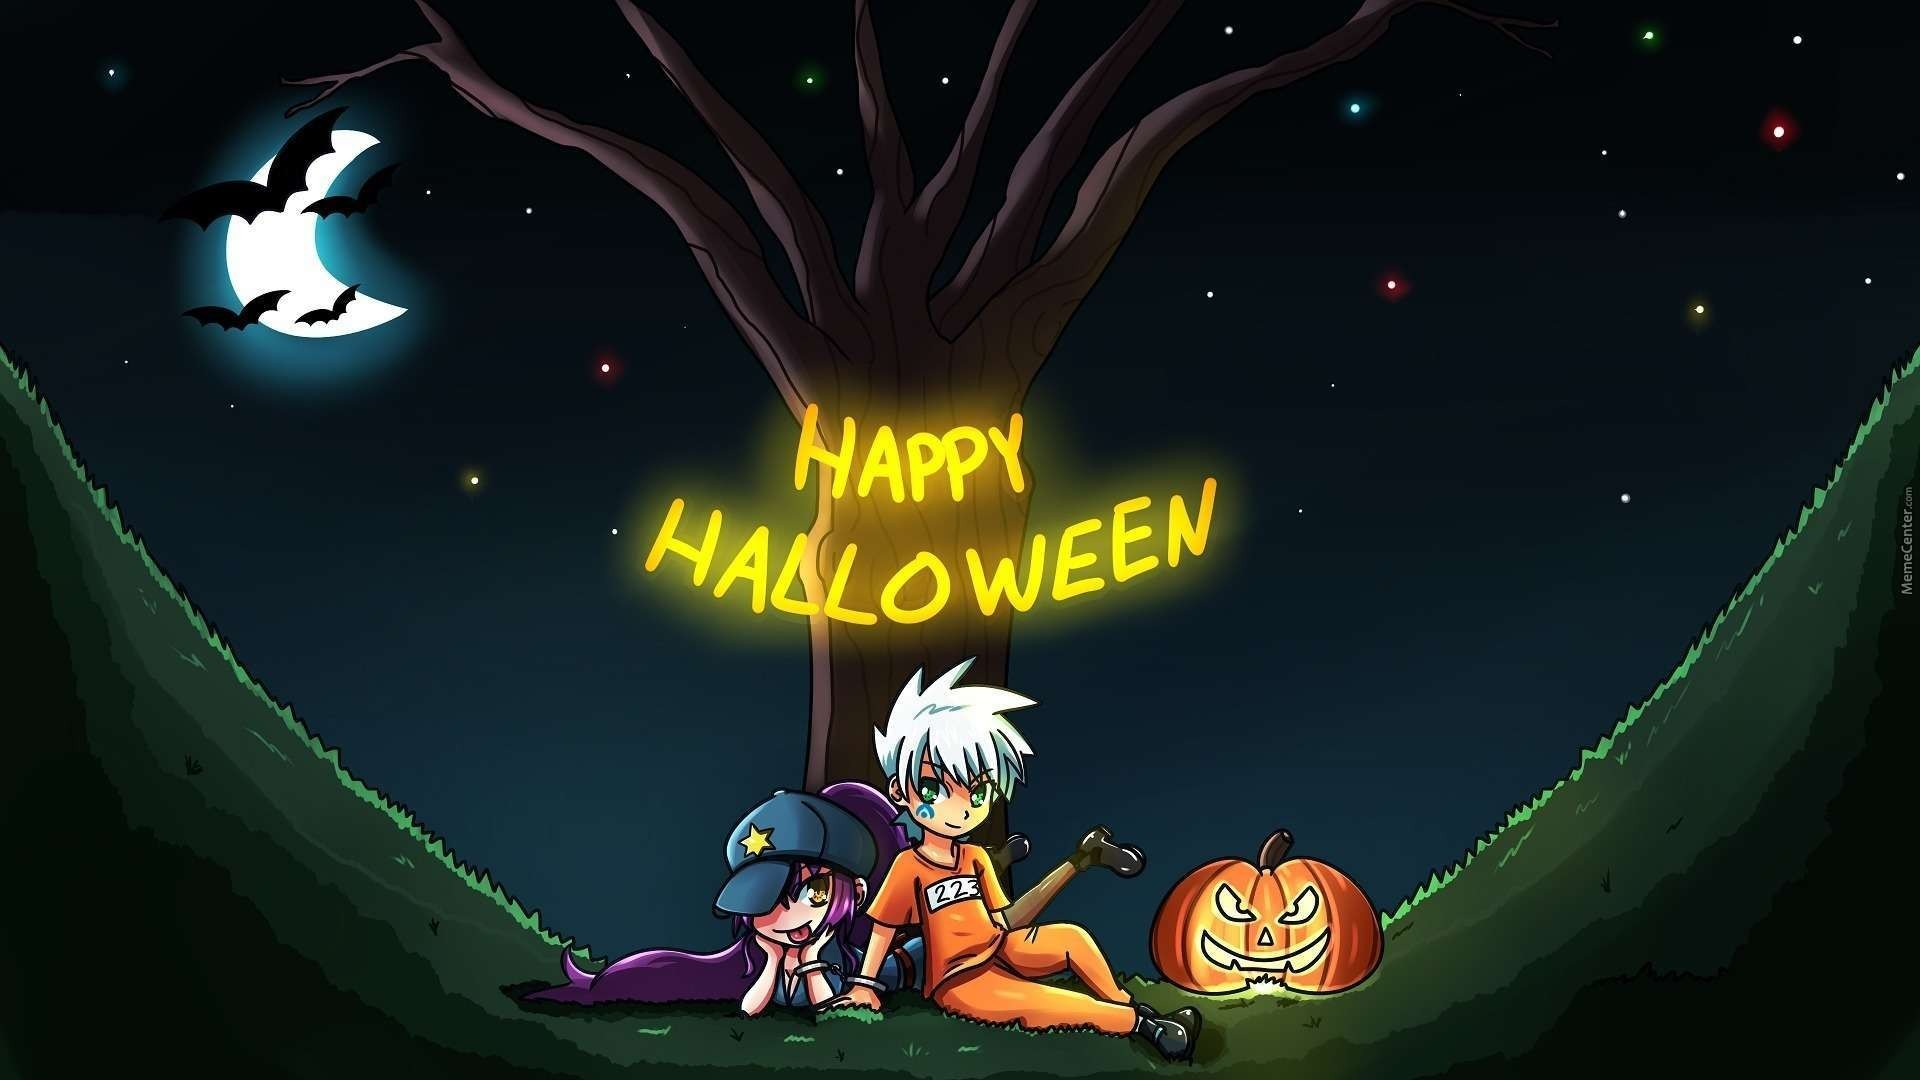 Anime Halloween Wallpaper ·① WallpaperTag